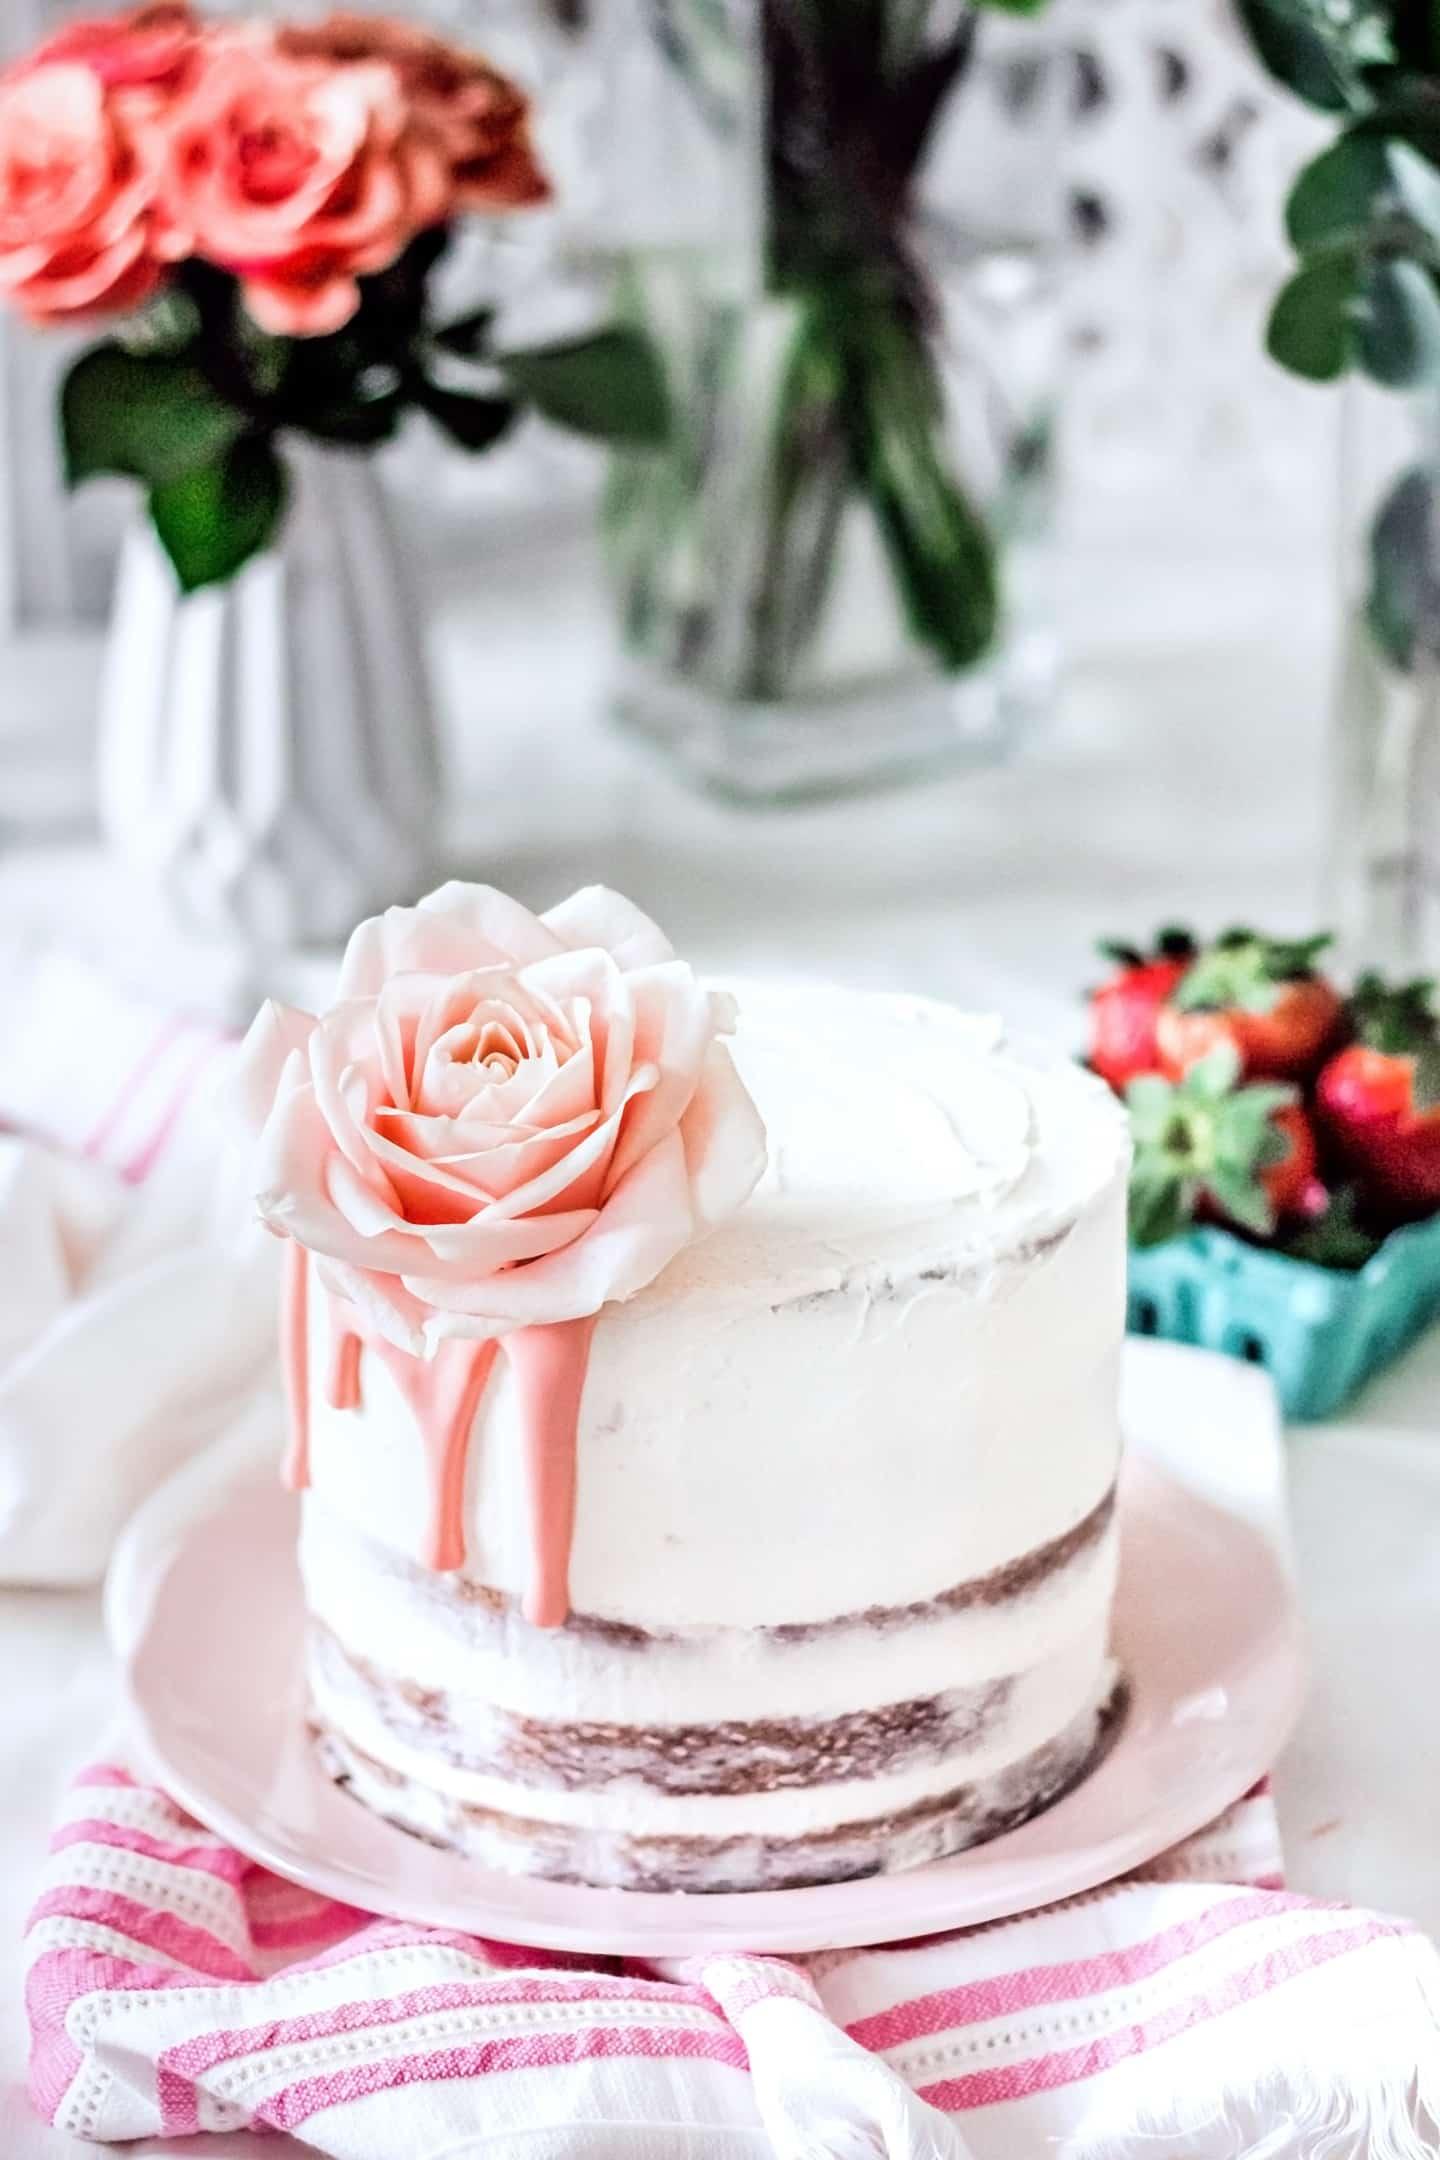 Layer cake fraises et fleurs fraiches